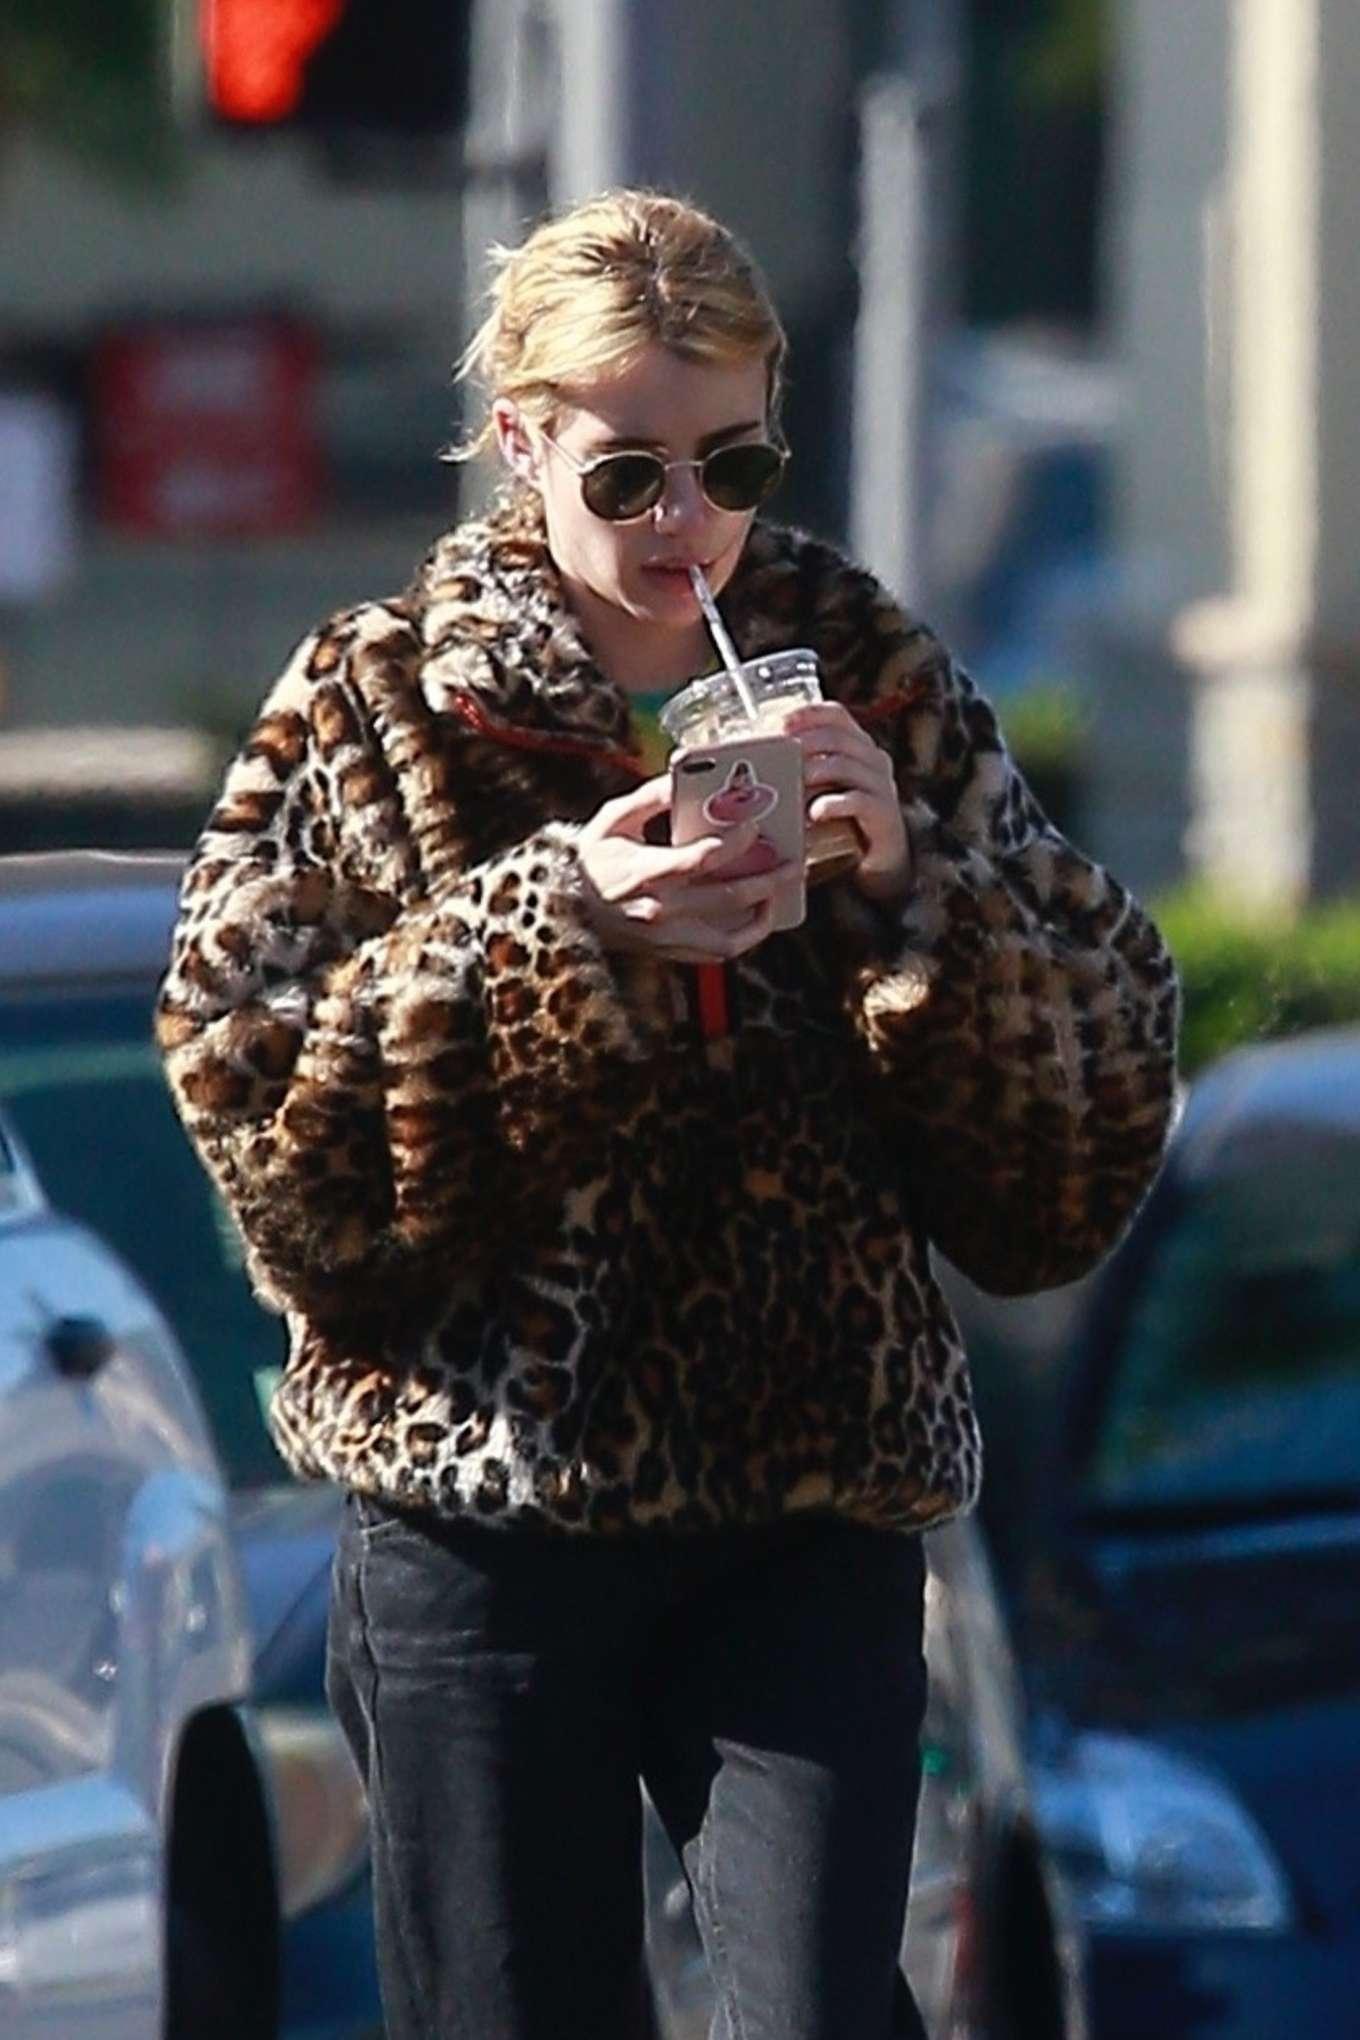 Emma Roberts in Animal Print Jacket - Makes a coffee run in LA